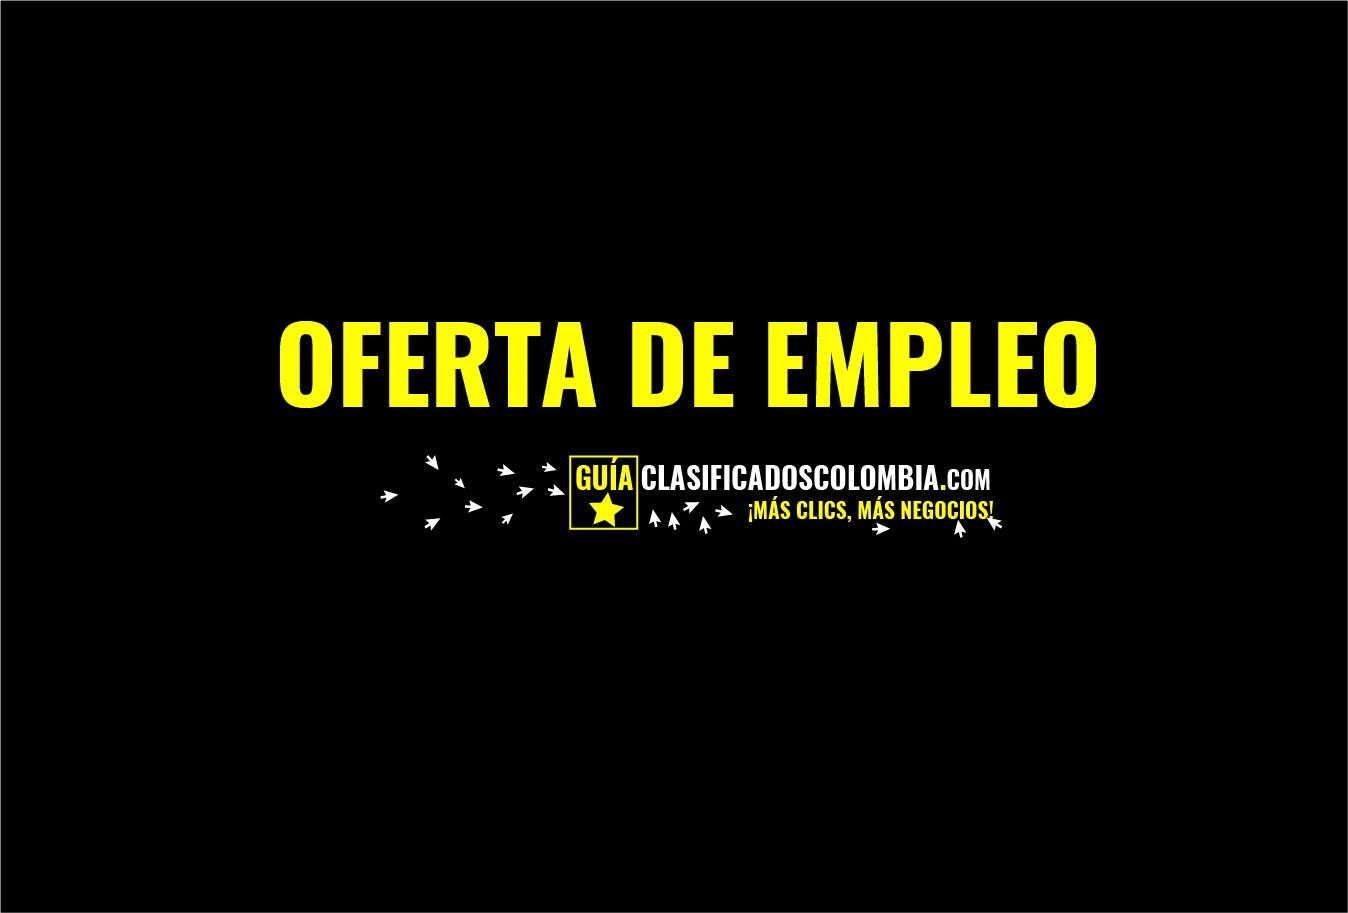 ASESORES COMERCIALES EMPLEO BOGOTA